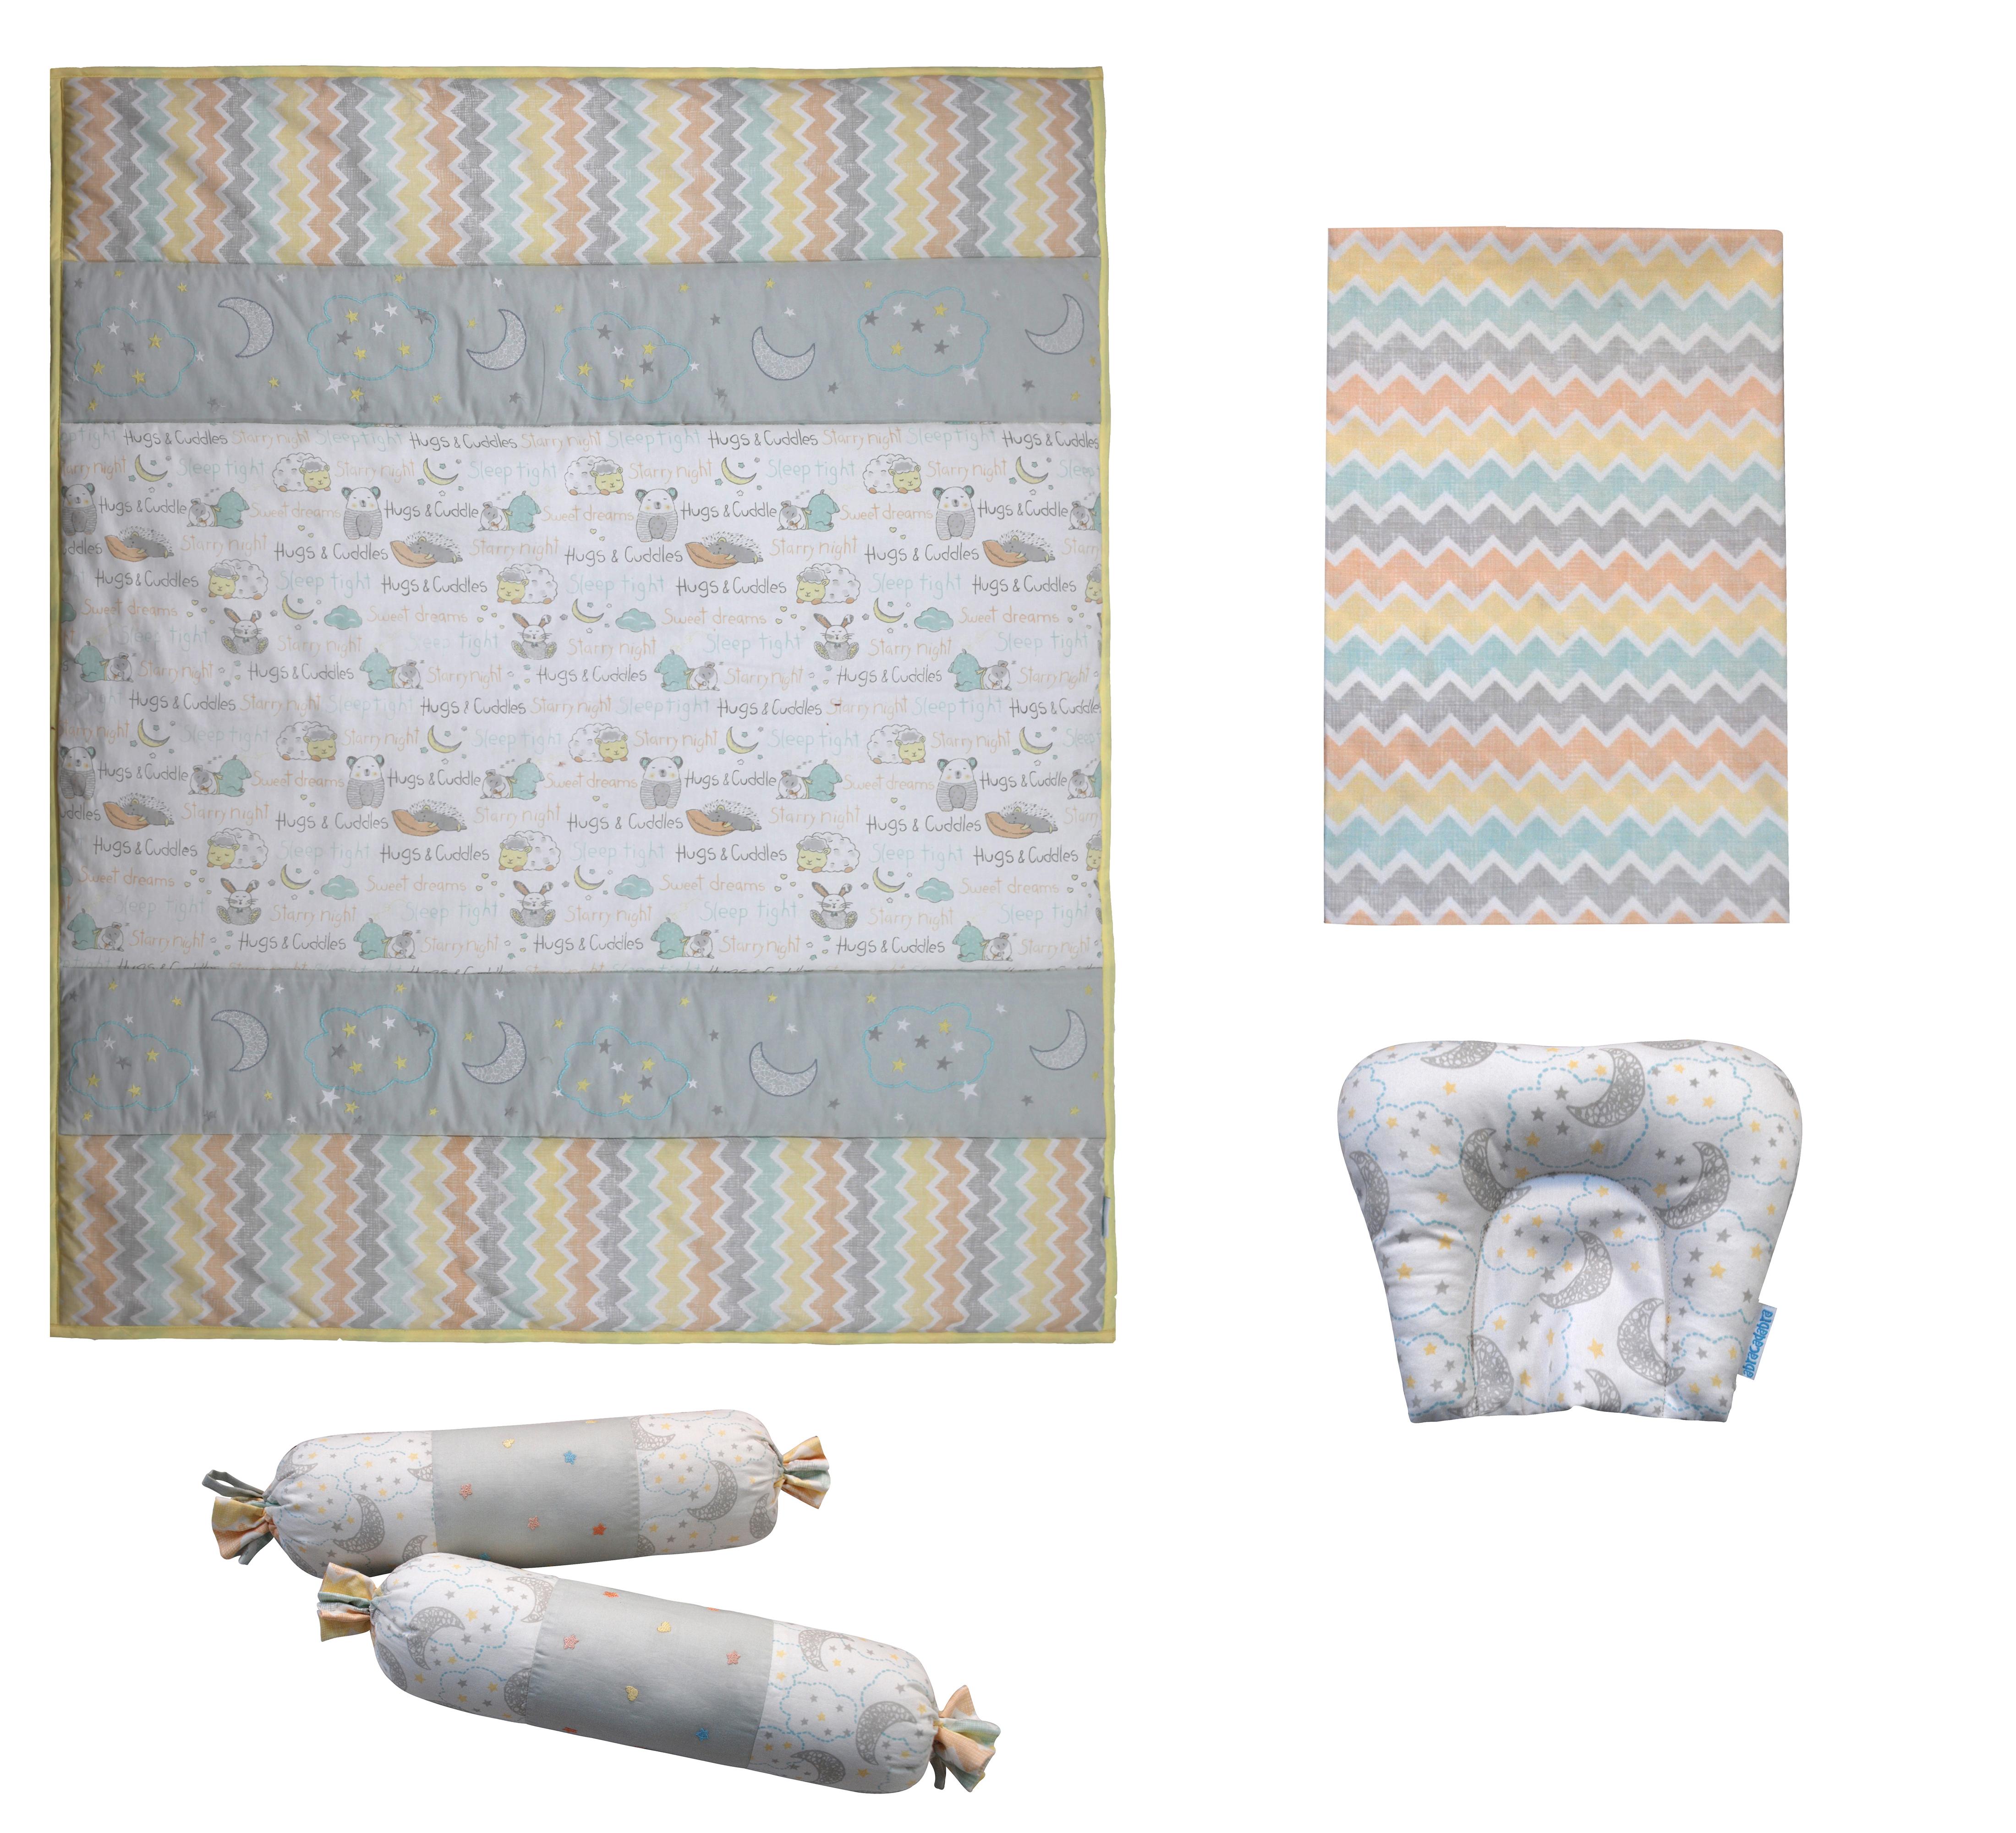 Mothercare | Abracadabra 5 Piece Cot Bedding Set - Sleepy Friends